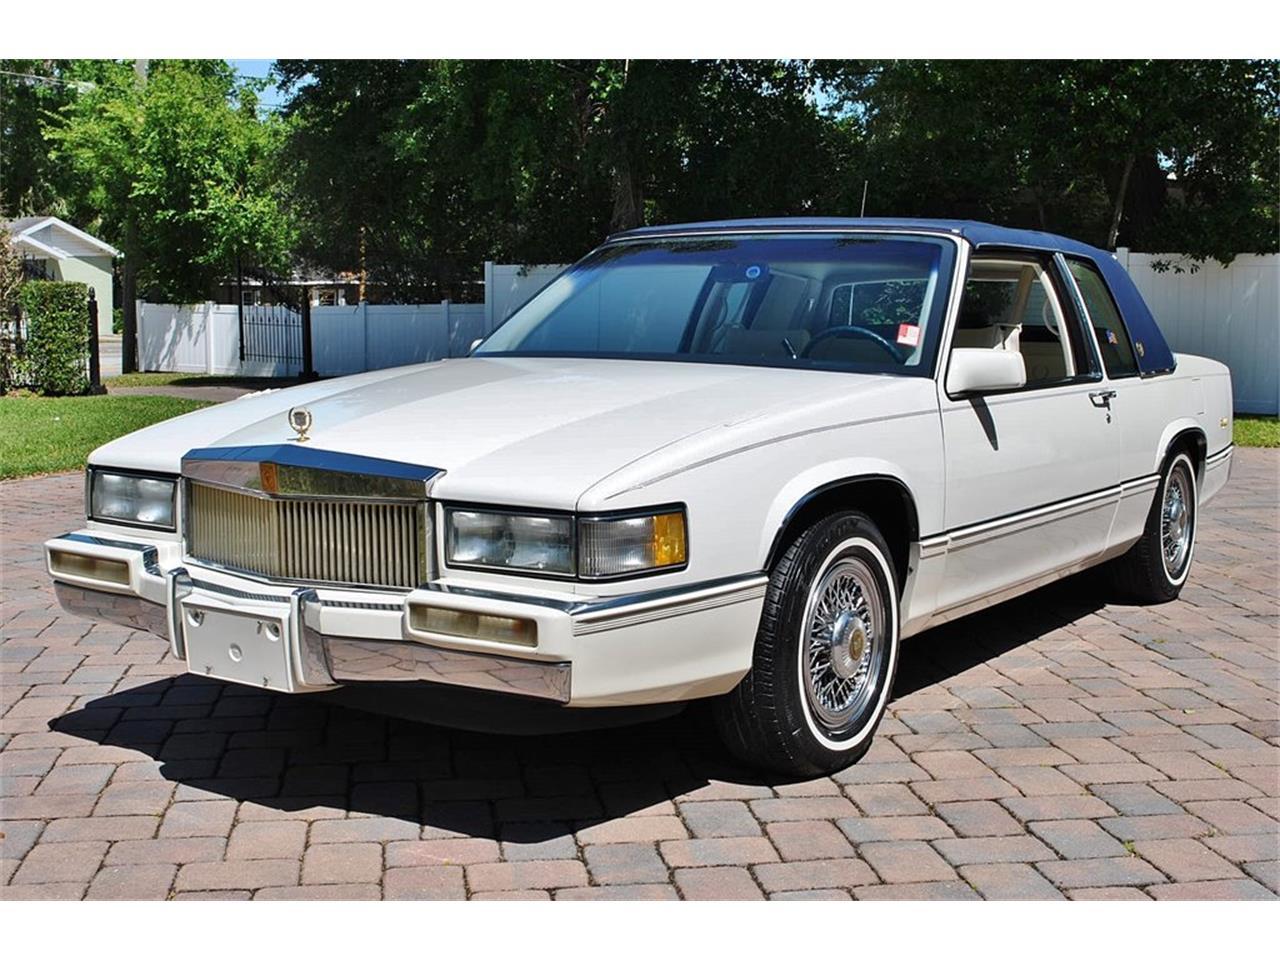 1990 cadillac deville for sale classiccars com cc 1081397 1990 cadillac deville for sale